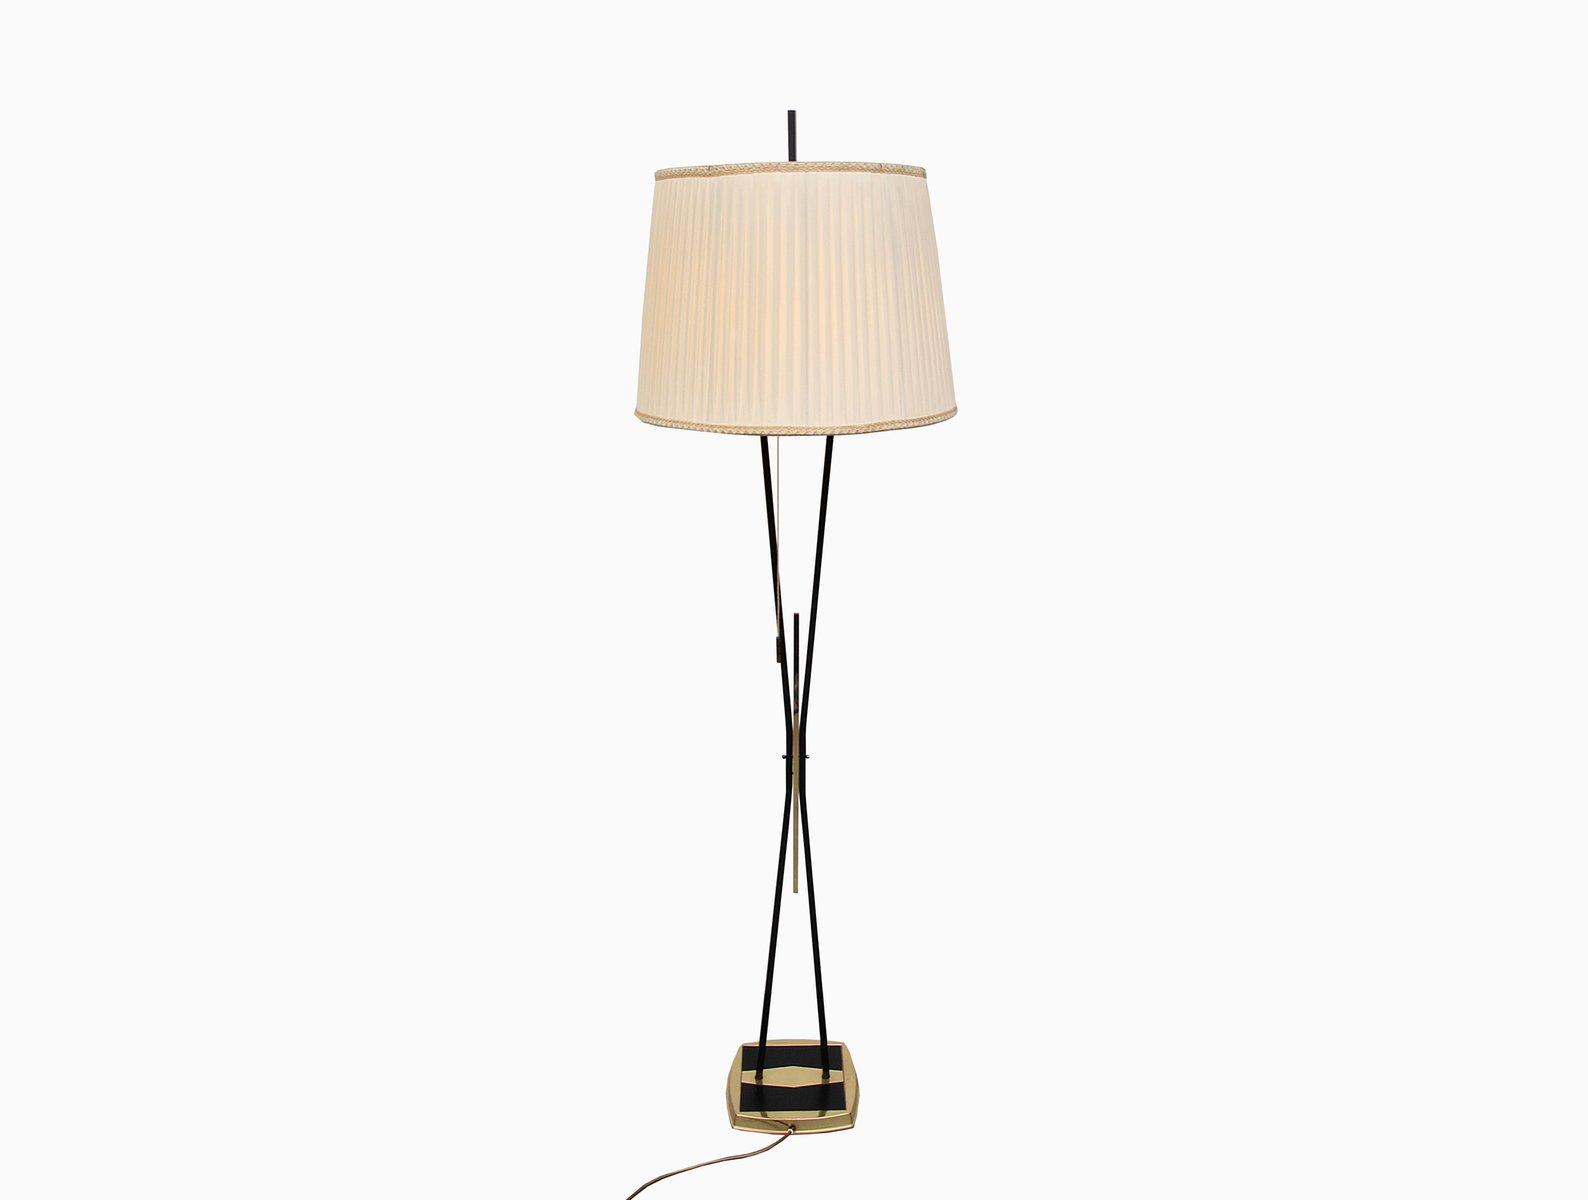 Stehlampe aus Messing & Schwarz Lackiertem Metal, 1950er